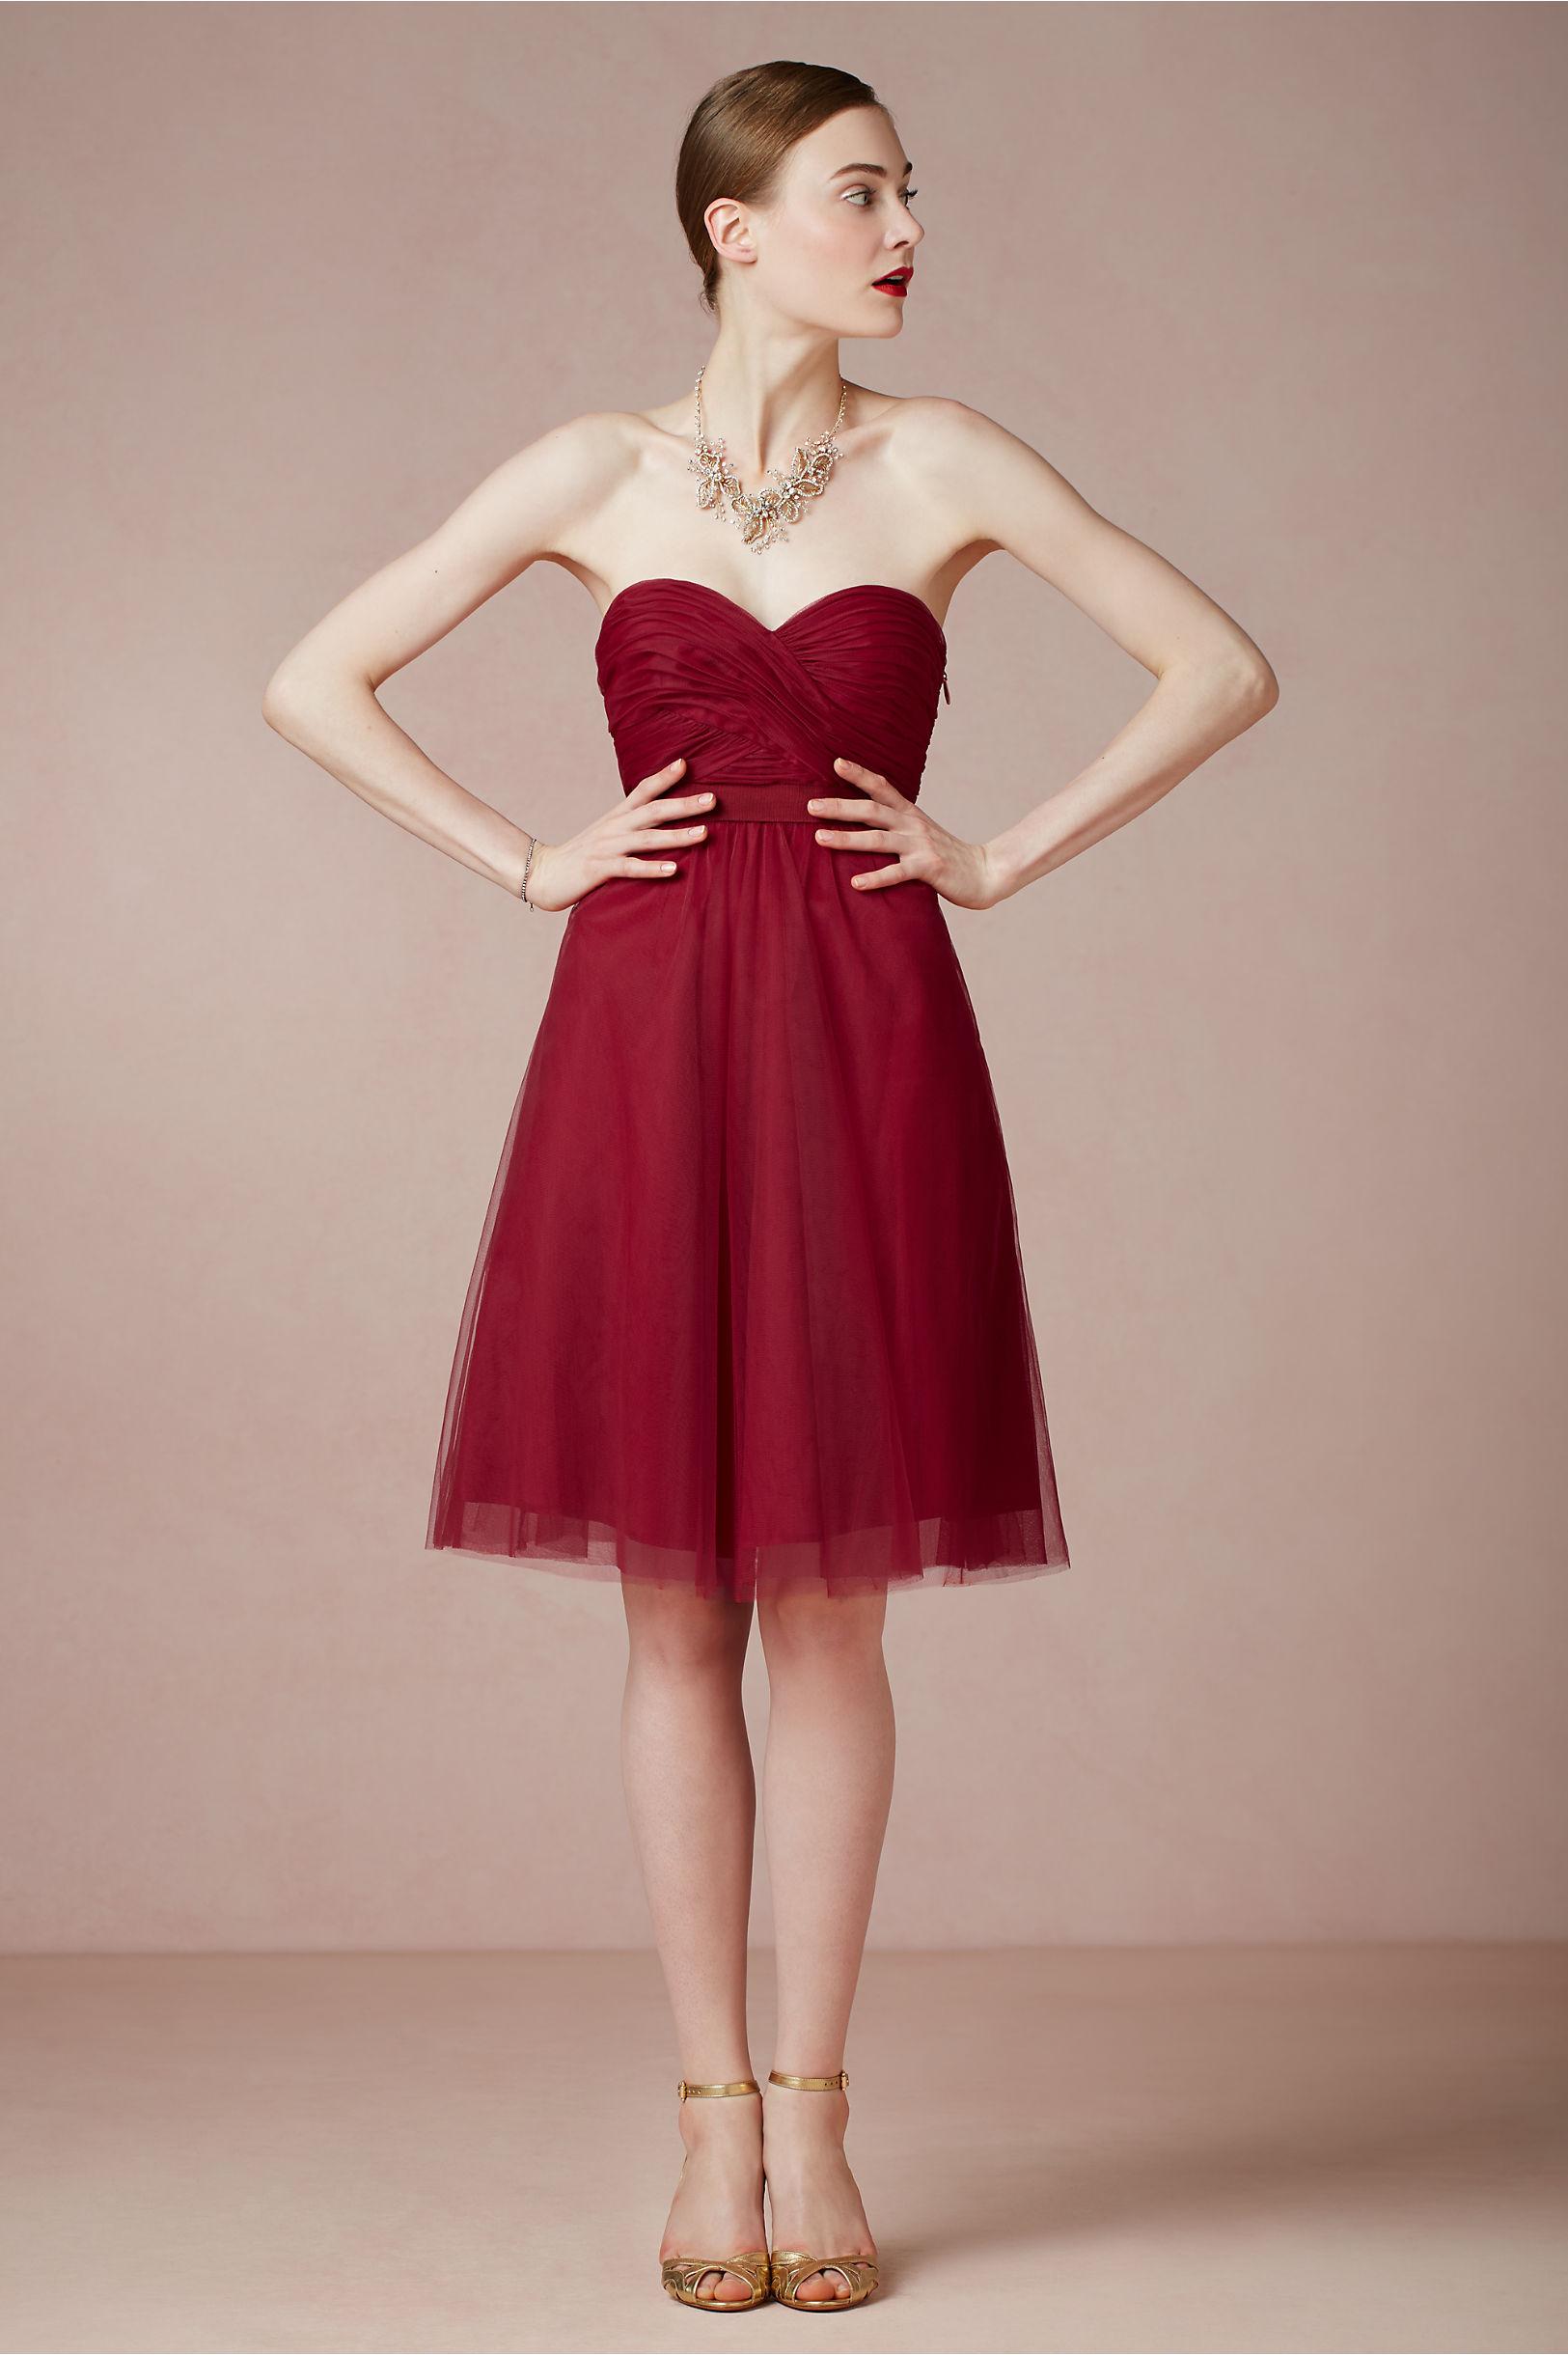 Choreography dress in bridal party bhldn crimson choreography dress bhldn ombrellifo Choice Image